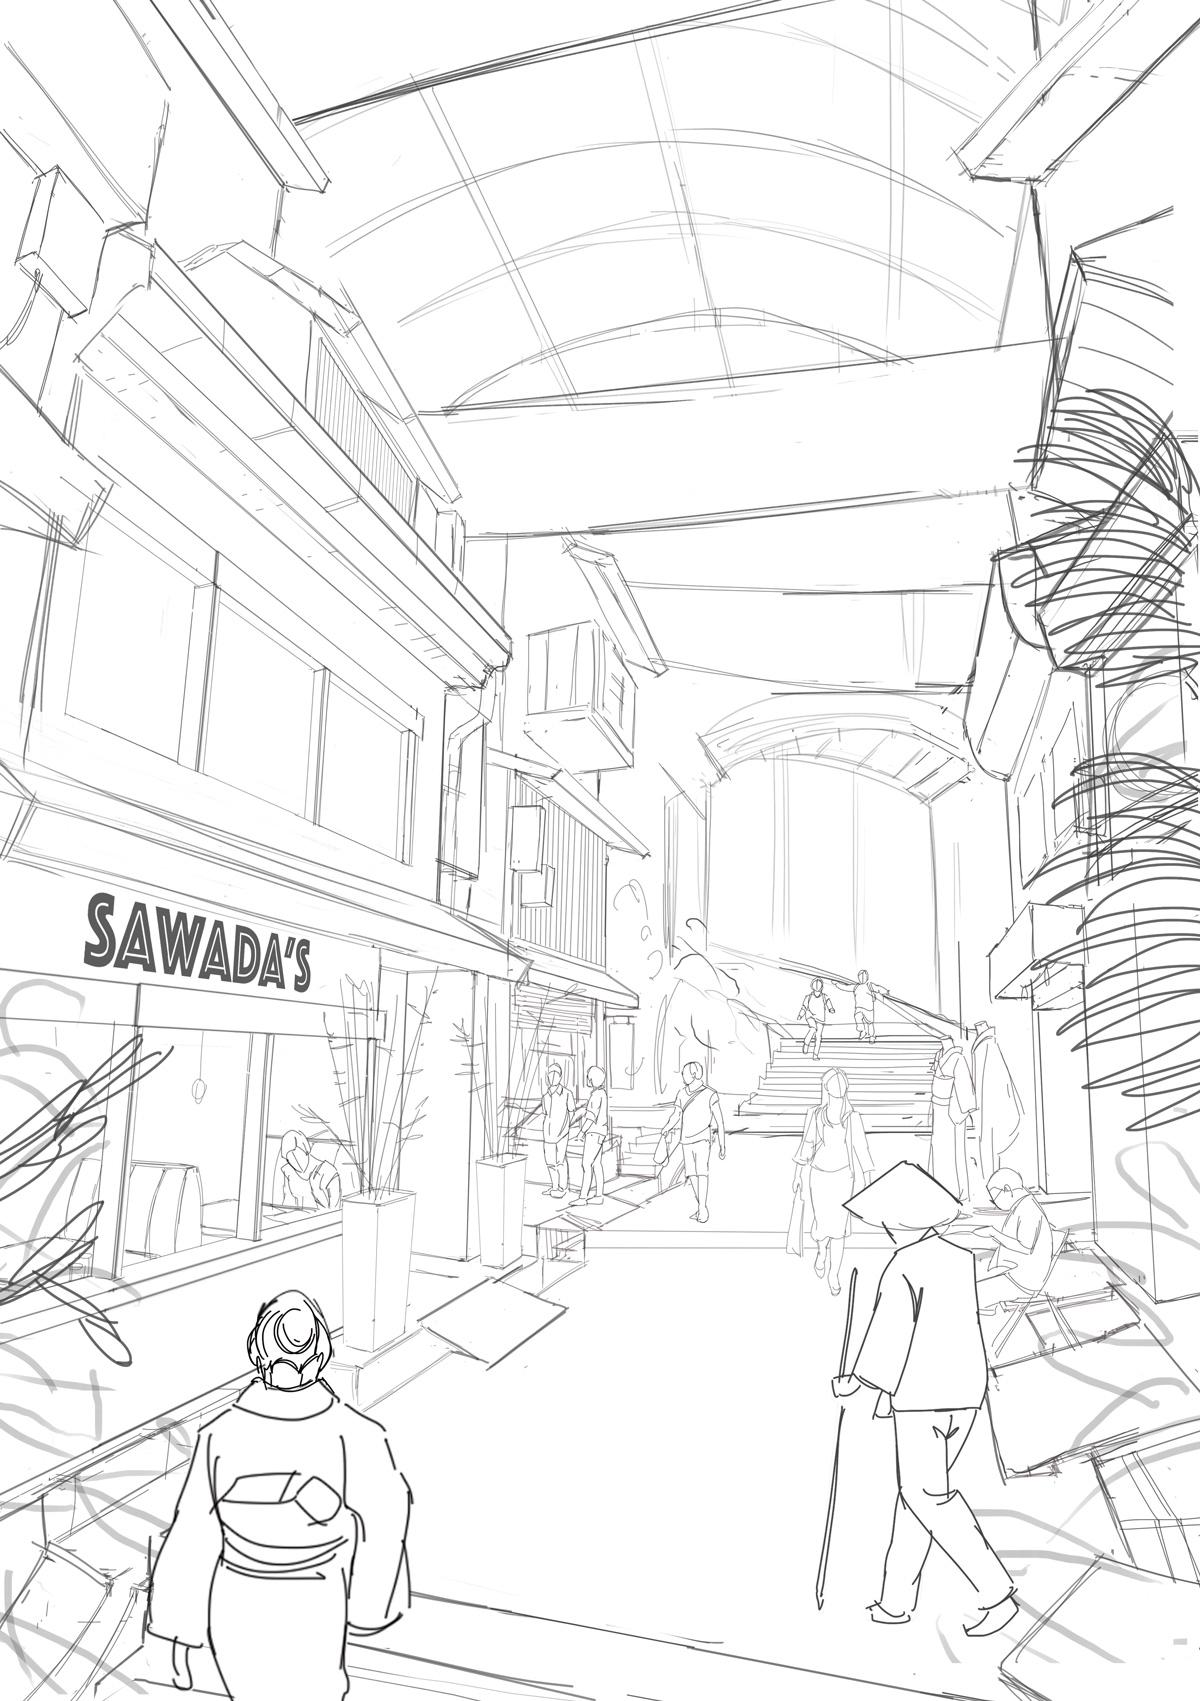 Illustration de Sandrine Pilloud | Japanese Market Sketch | Livre Kanako Sawada écrit par Lionel Tardy